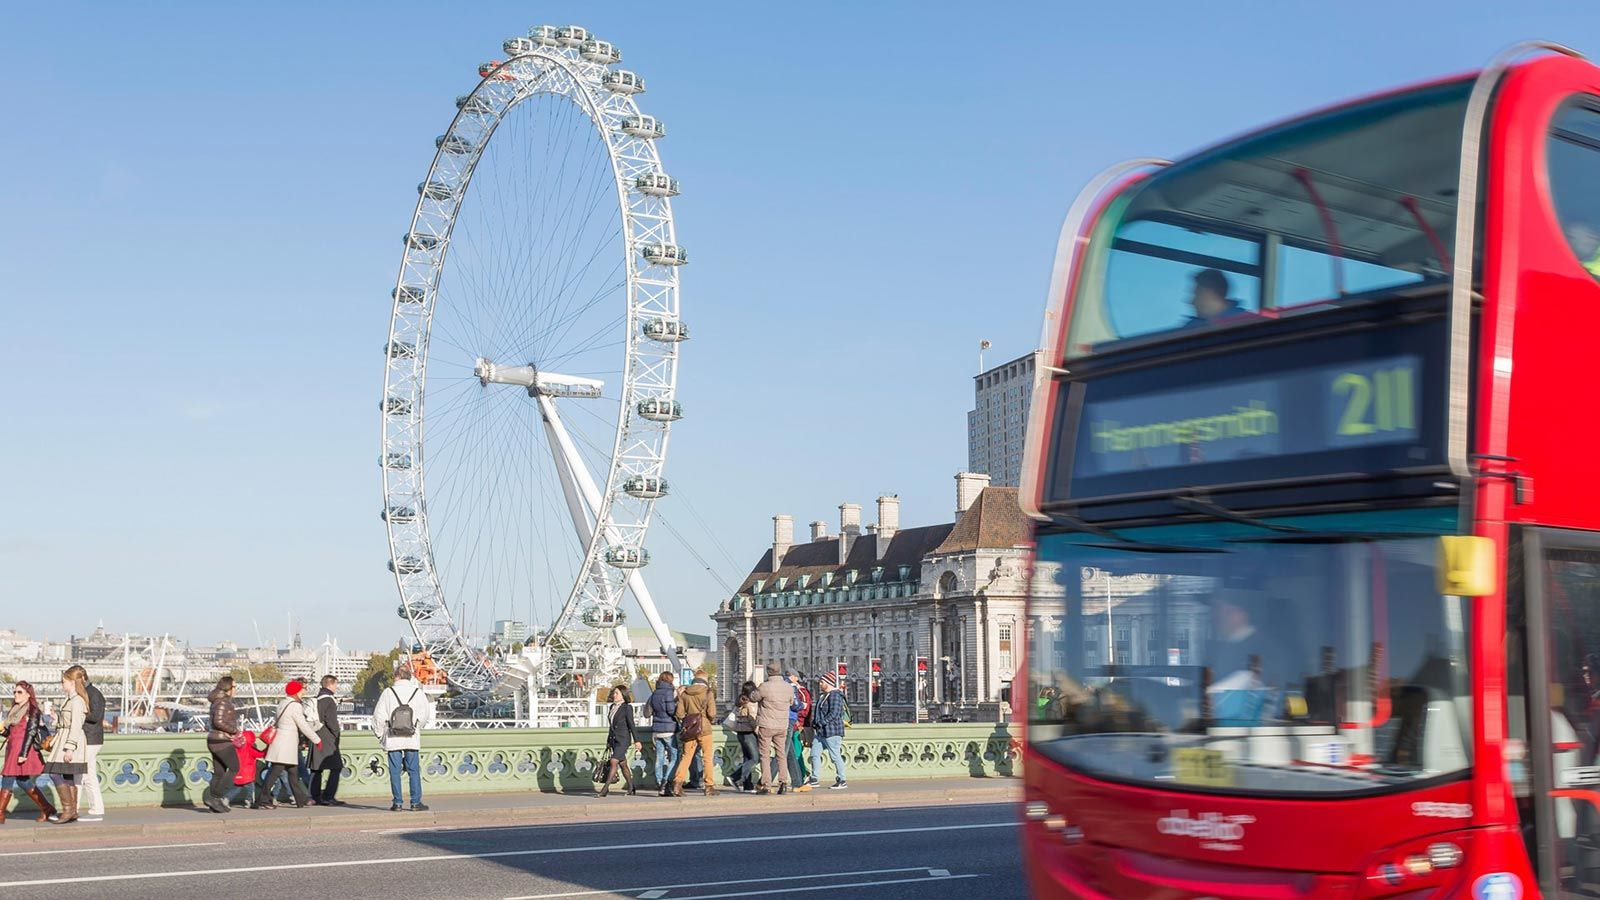 London Eye view from the bridge - Mace Group